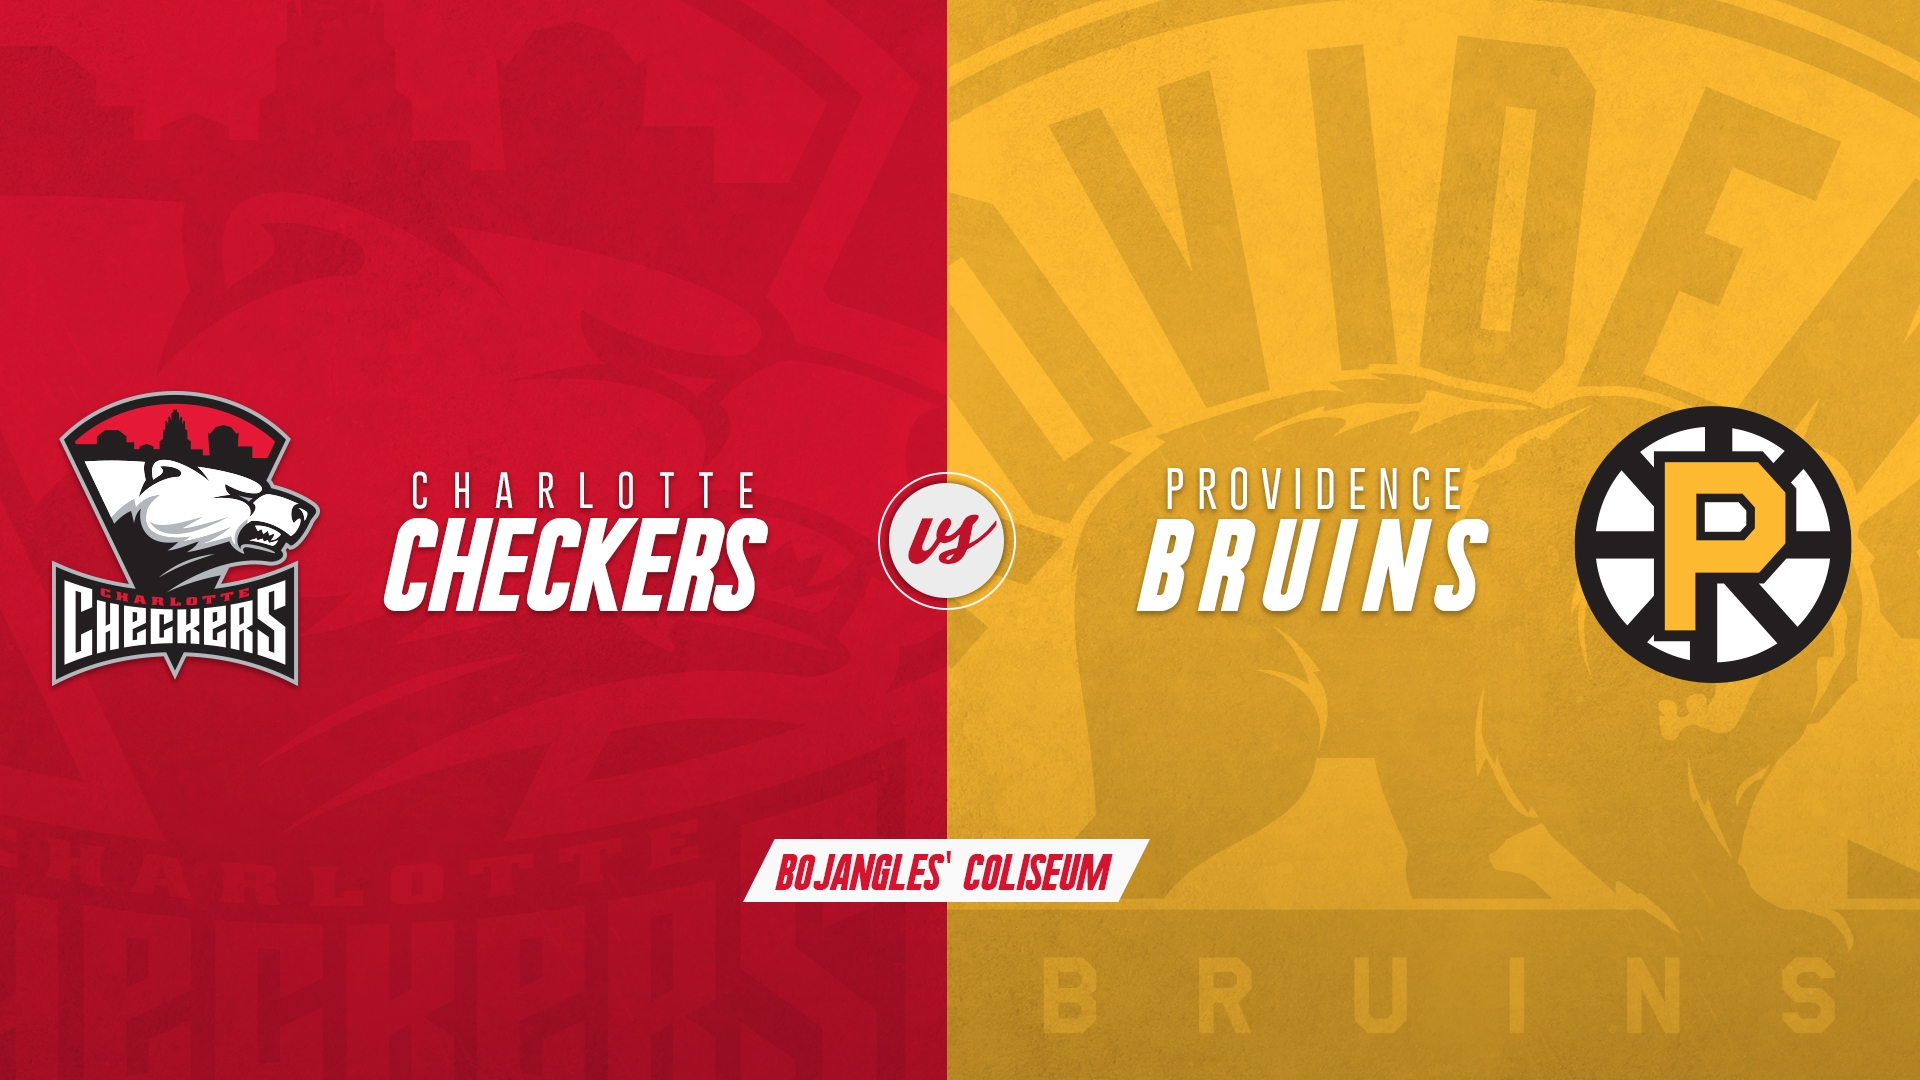 Charlotte Checkers vs. Providence Bruins